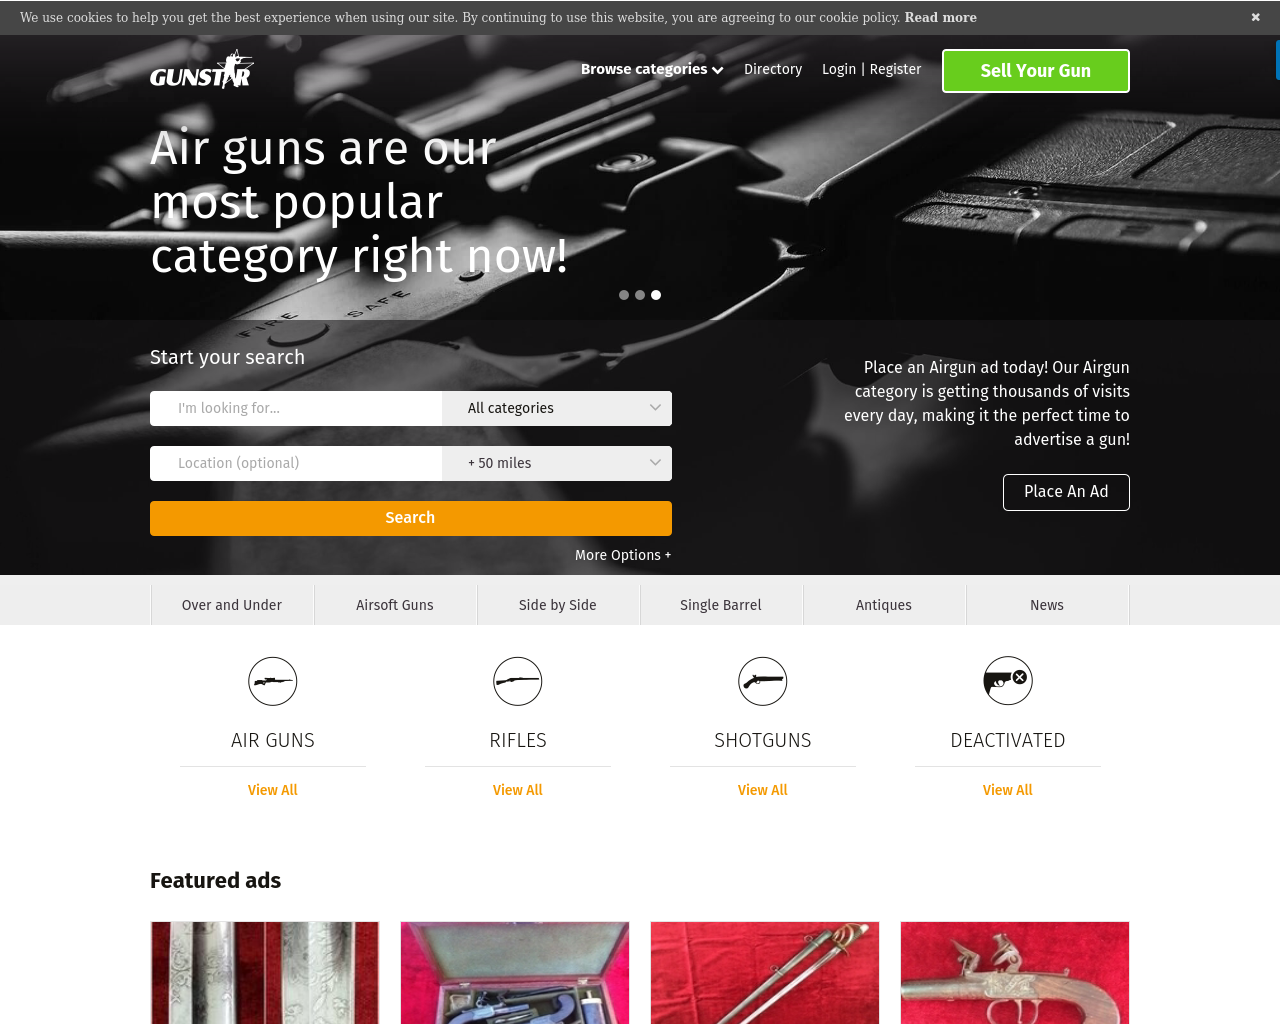 Gunstar-Advertising-Reviews-Pricing